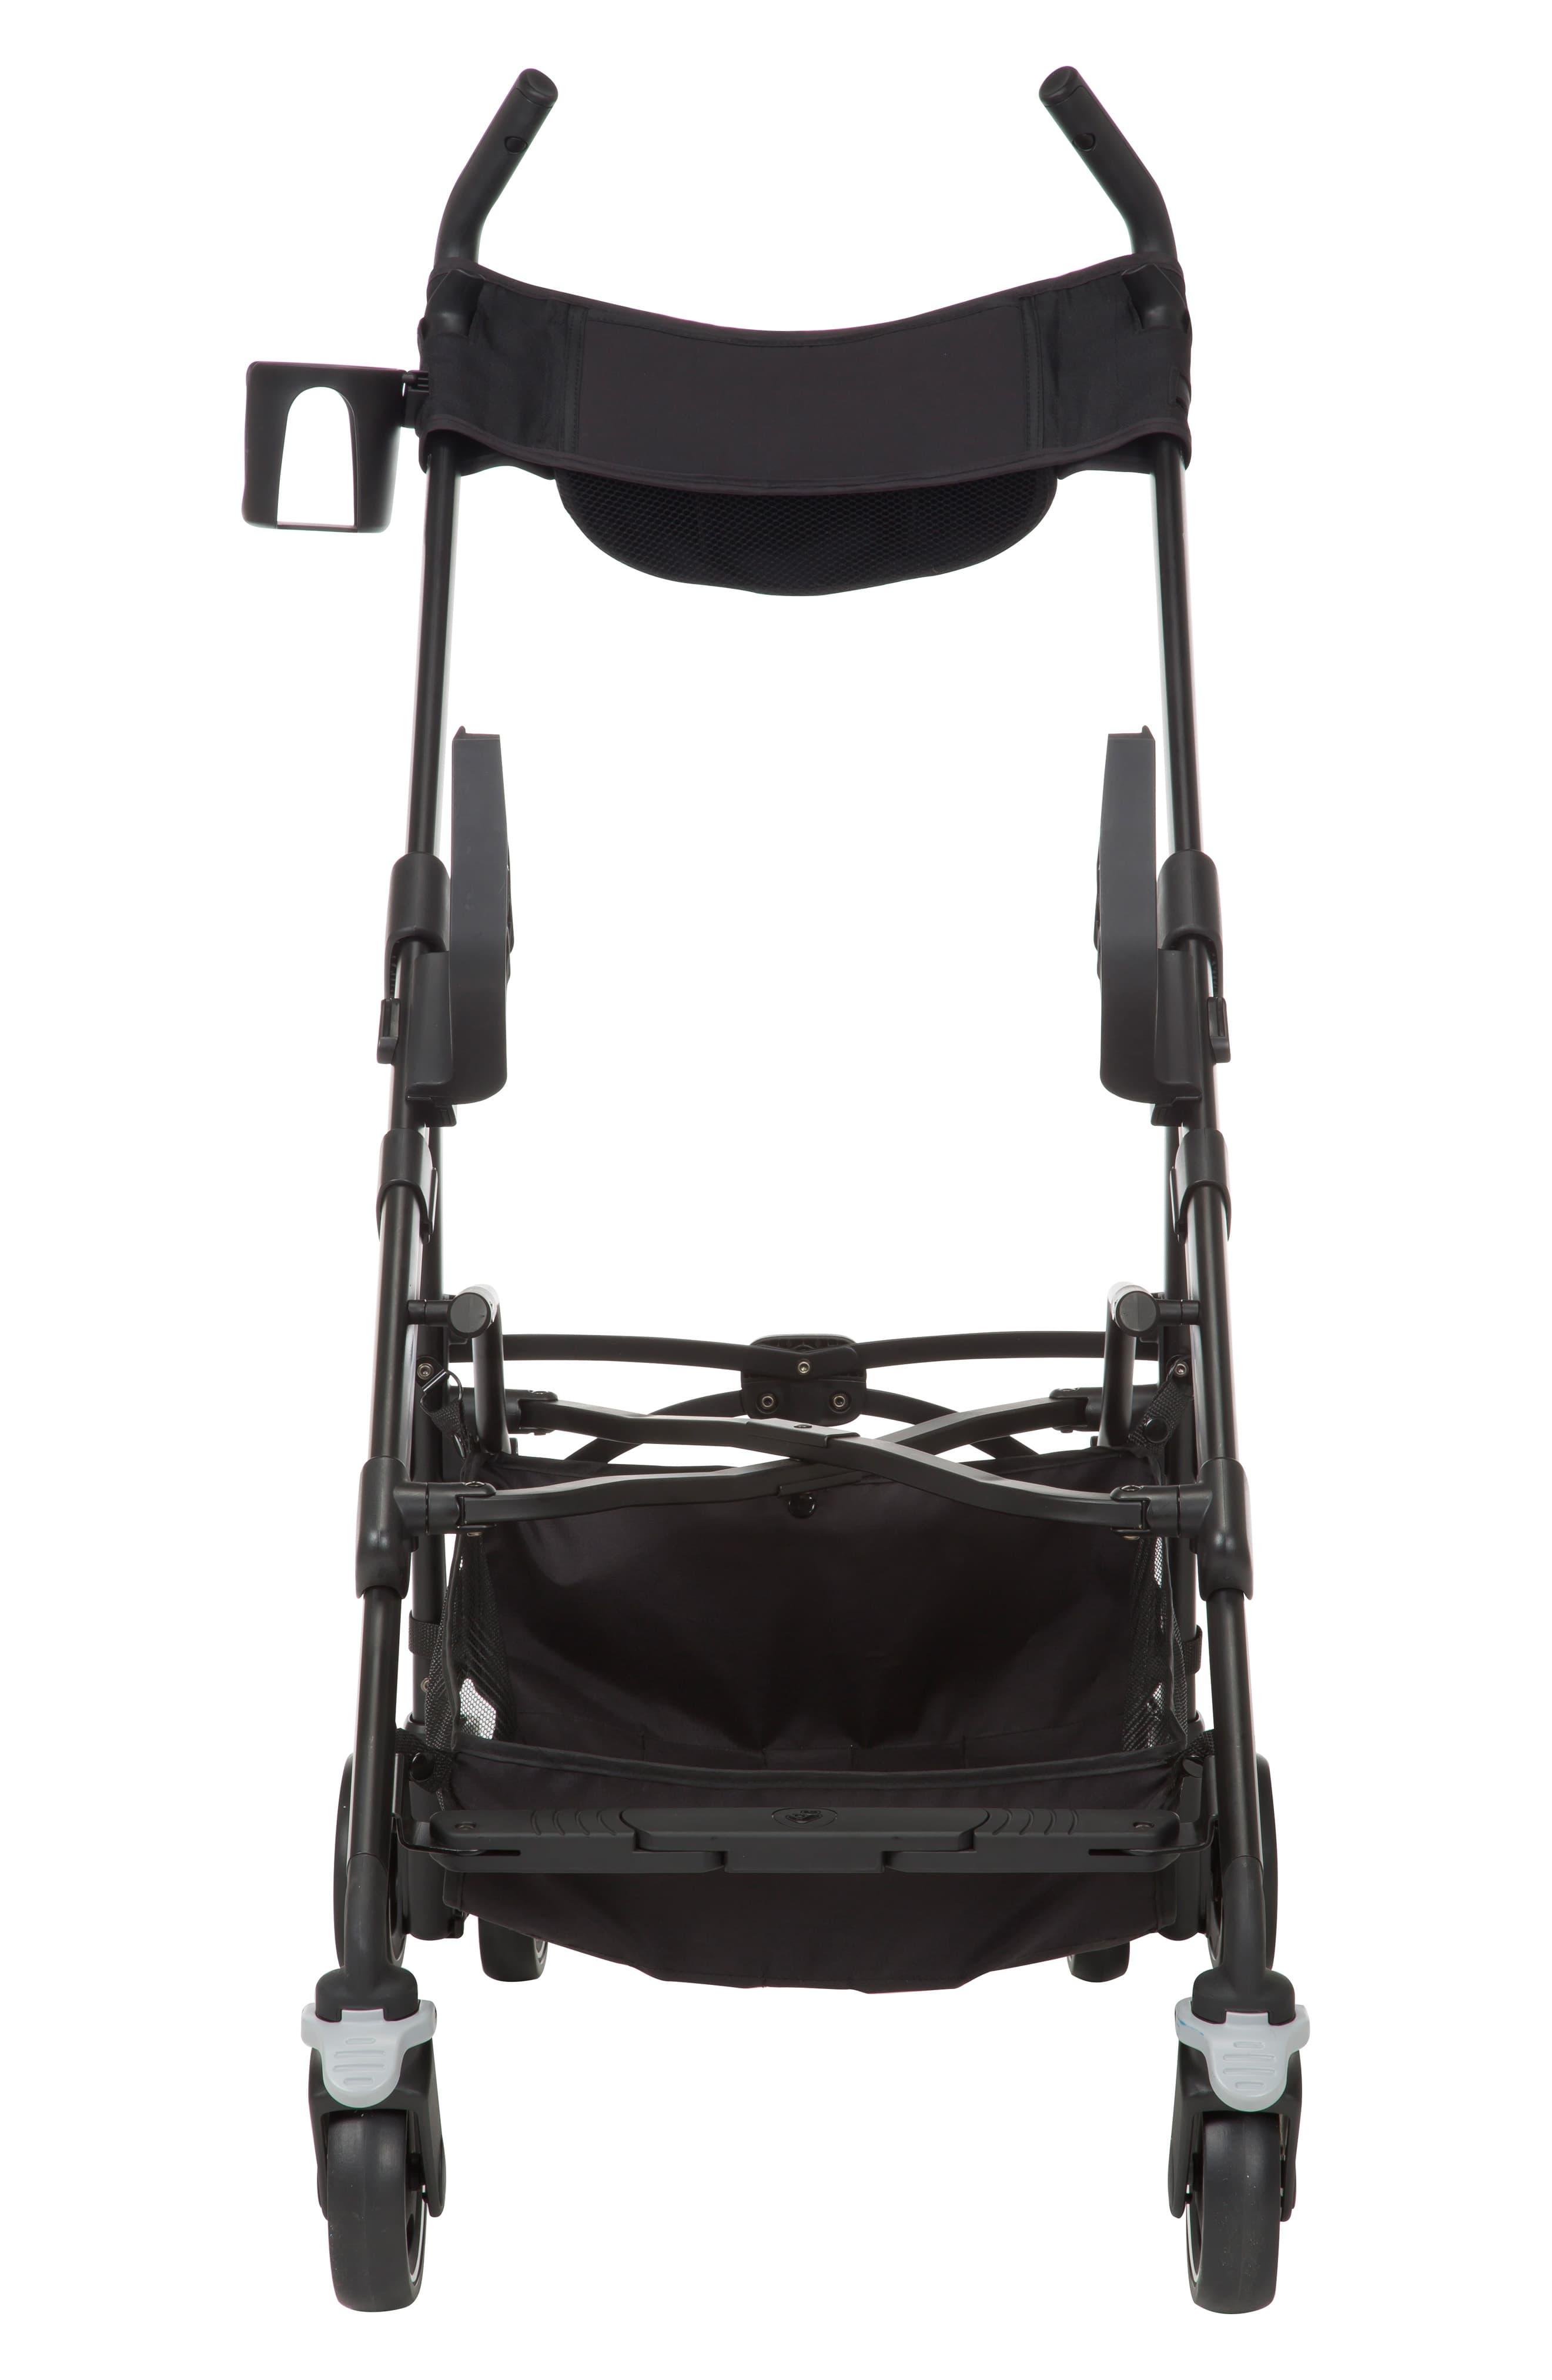 Infant MaxiCosi MaxiTaxi Stroller Frame, Size One Size